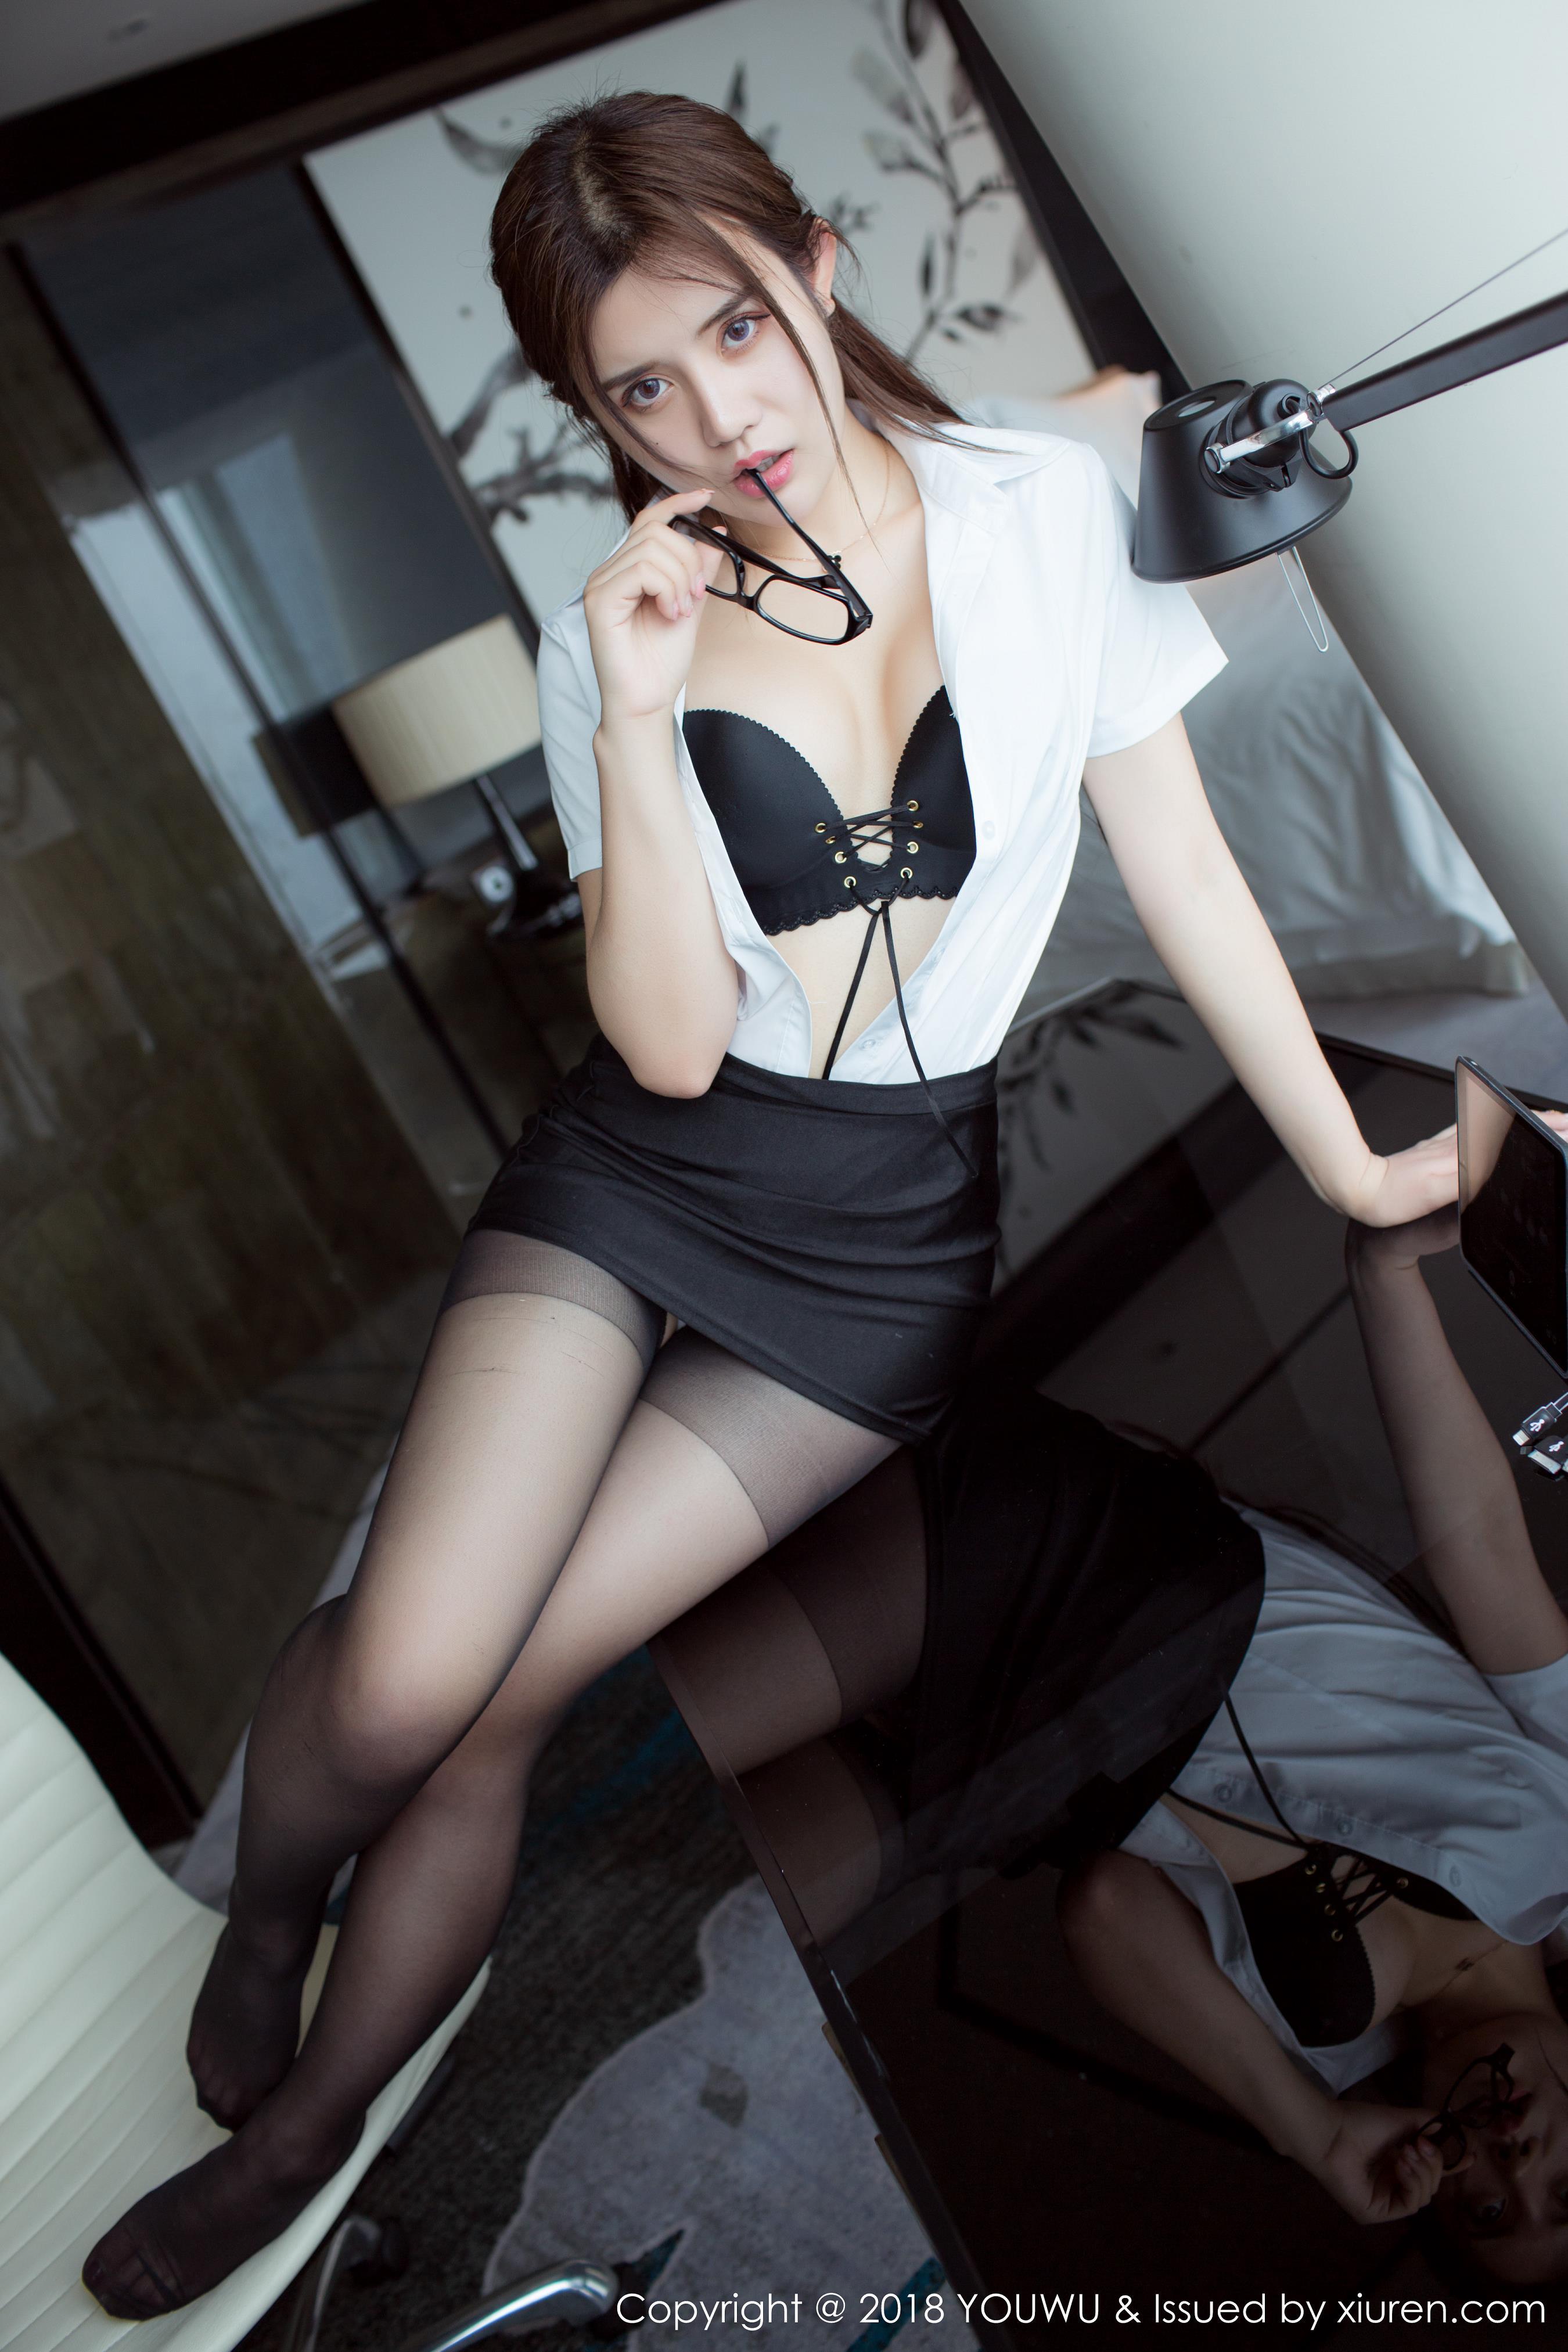 [YouWu尤物馆]YOU20180307VOL0081 性感女秘书 兔子Nina 黑色内衣与黑色包臀短裙加黑色丝袜美腿私房写真集,